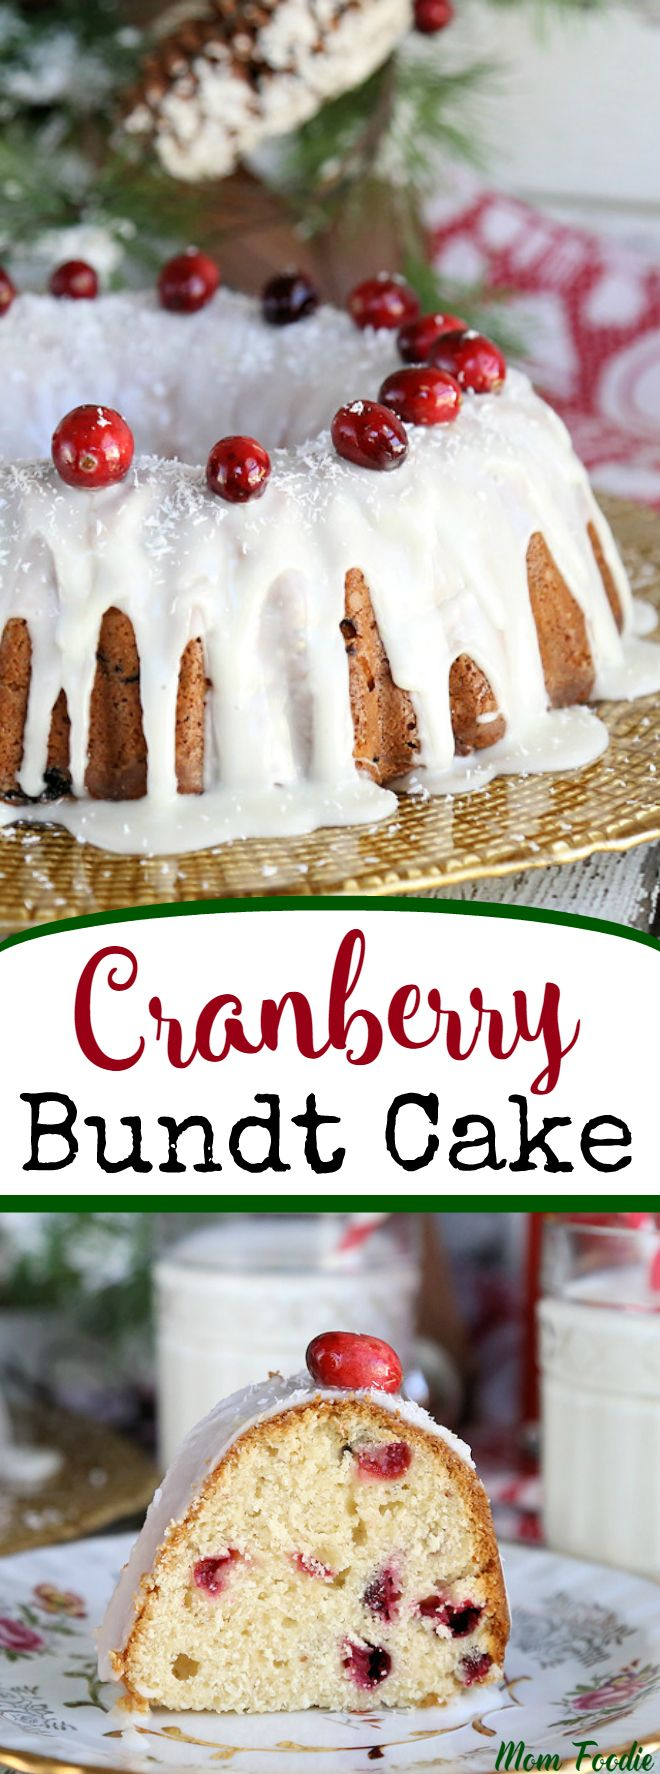 Cranberry Sour Cream Bundt Cake - Fresh Cranberry Cake Recipe  @horizonorganic  #HorizonHolidays #ad